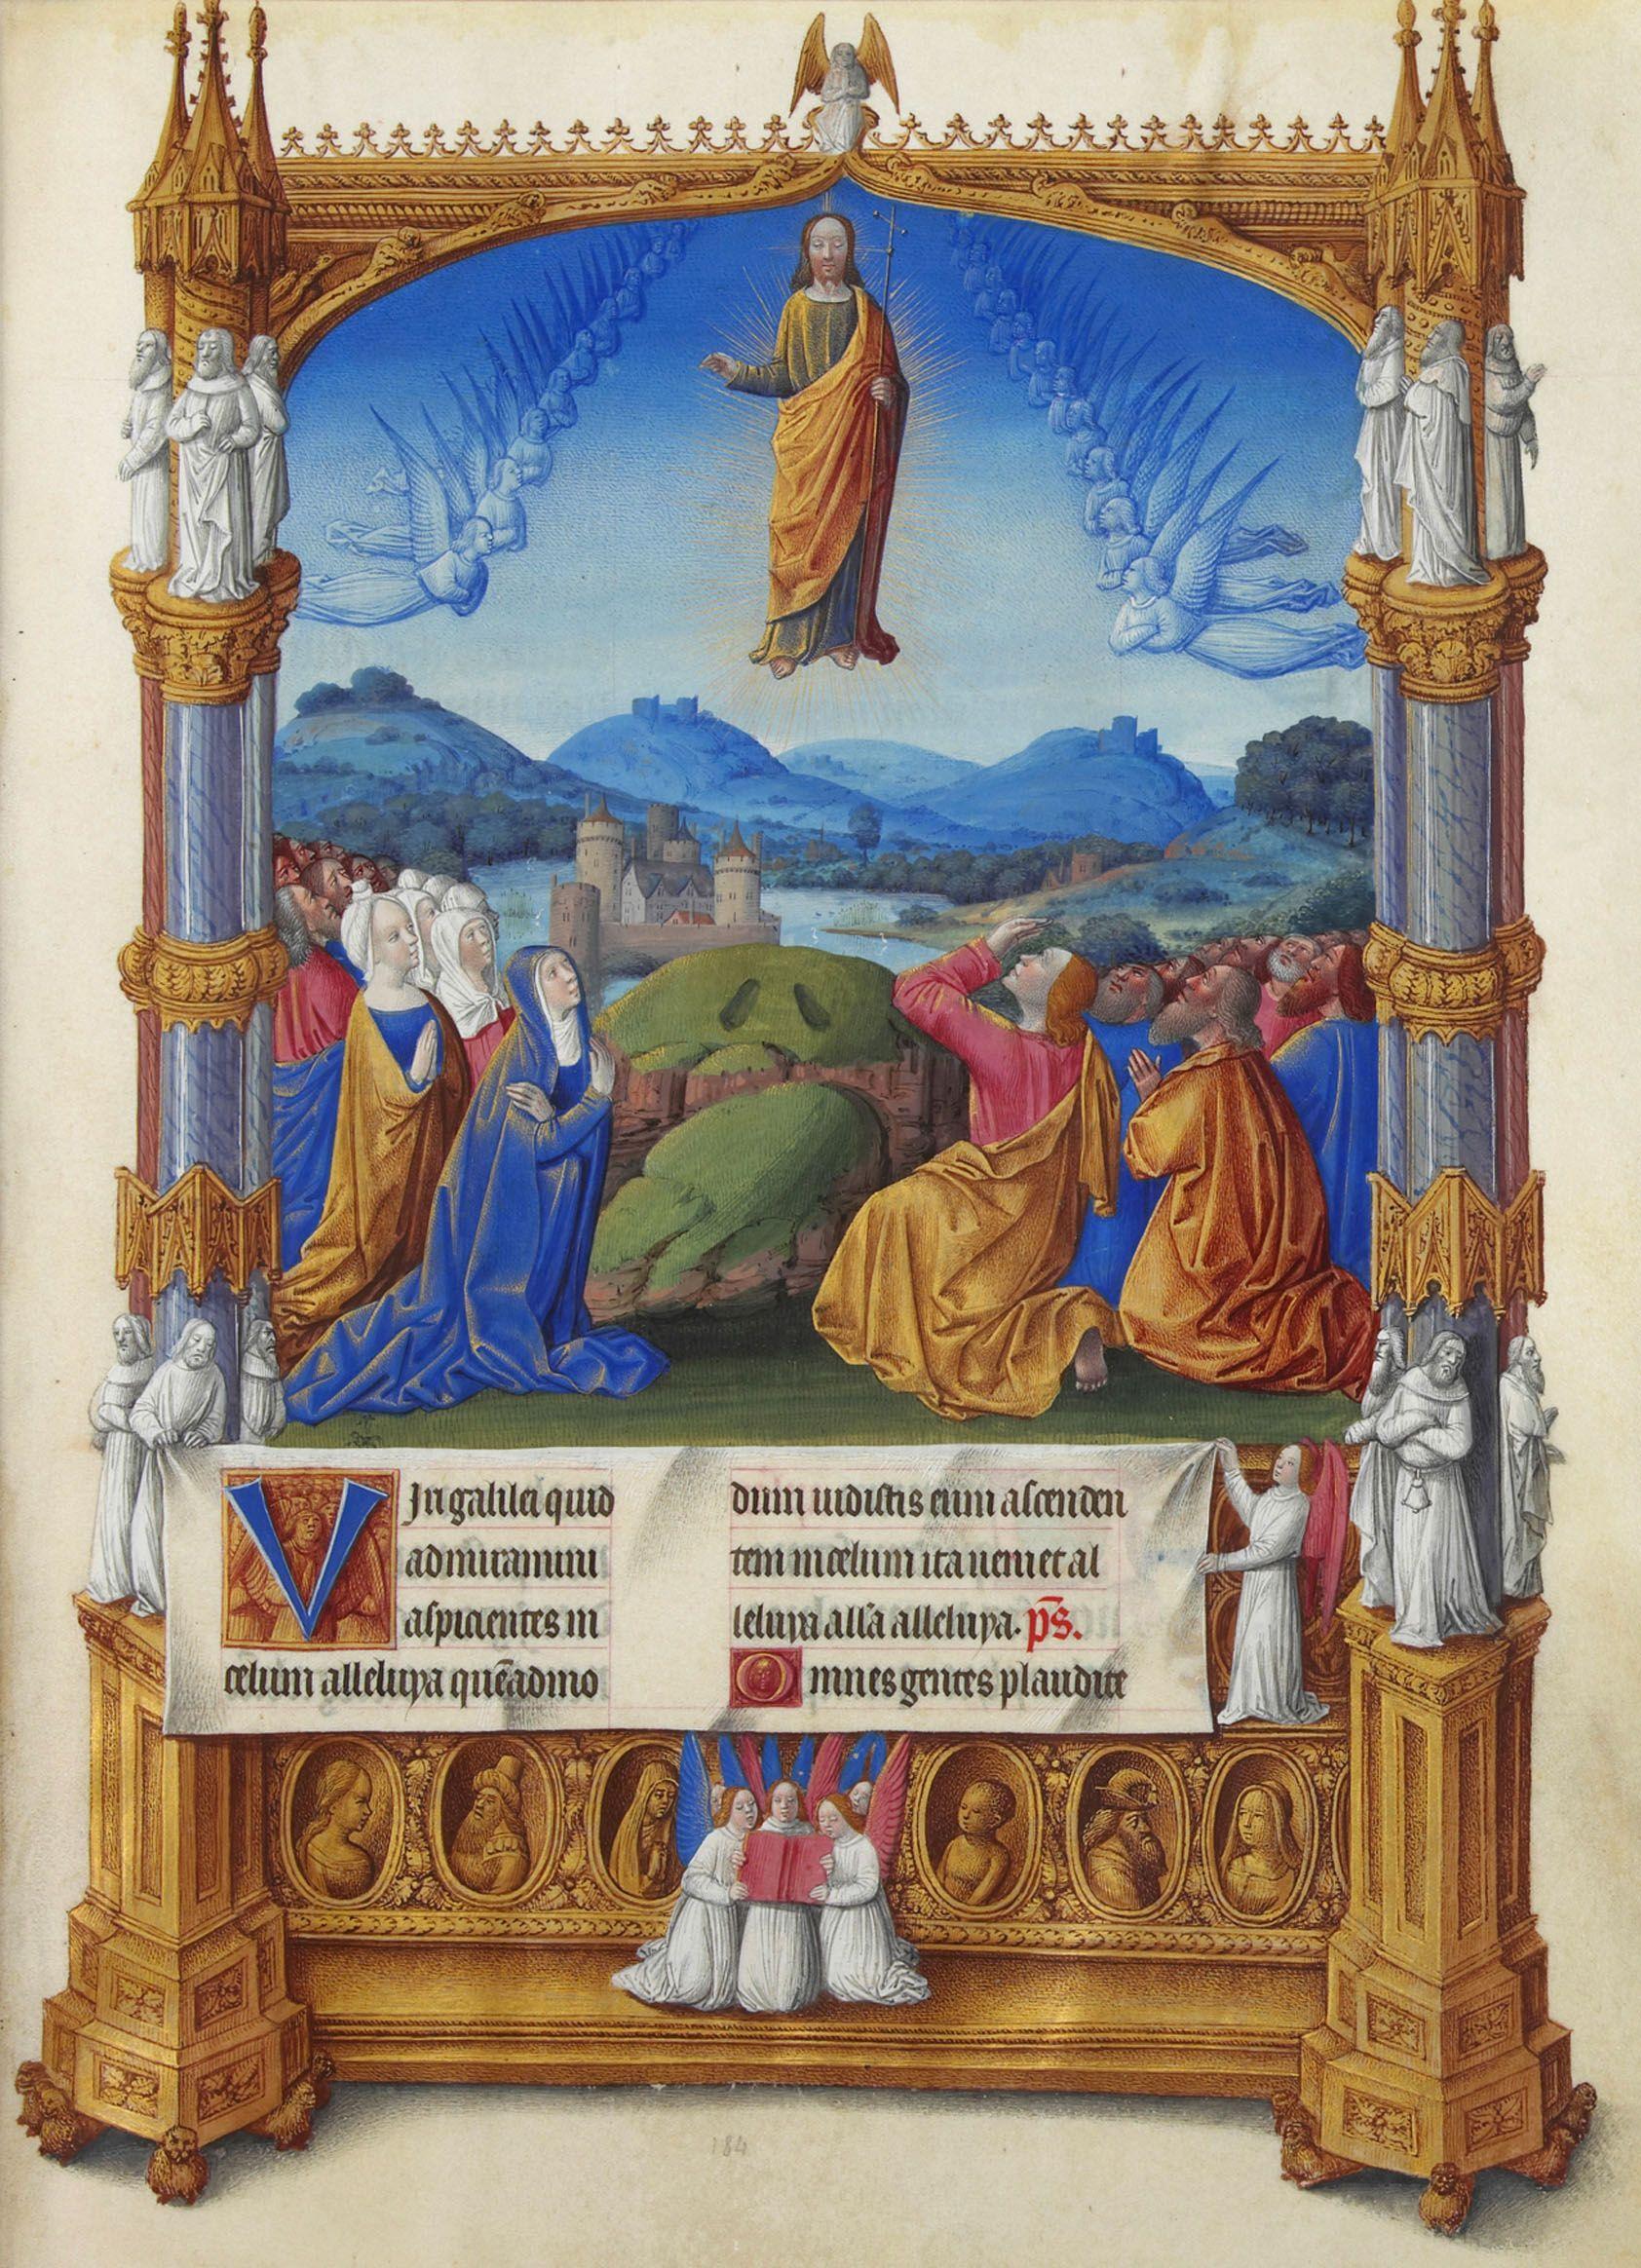 Folio_184r_-_The_Ascension.jpg (1684×2328)